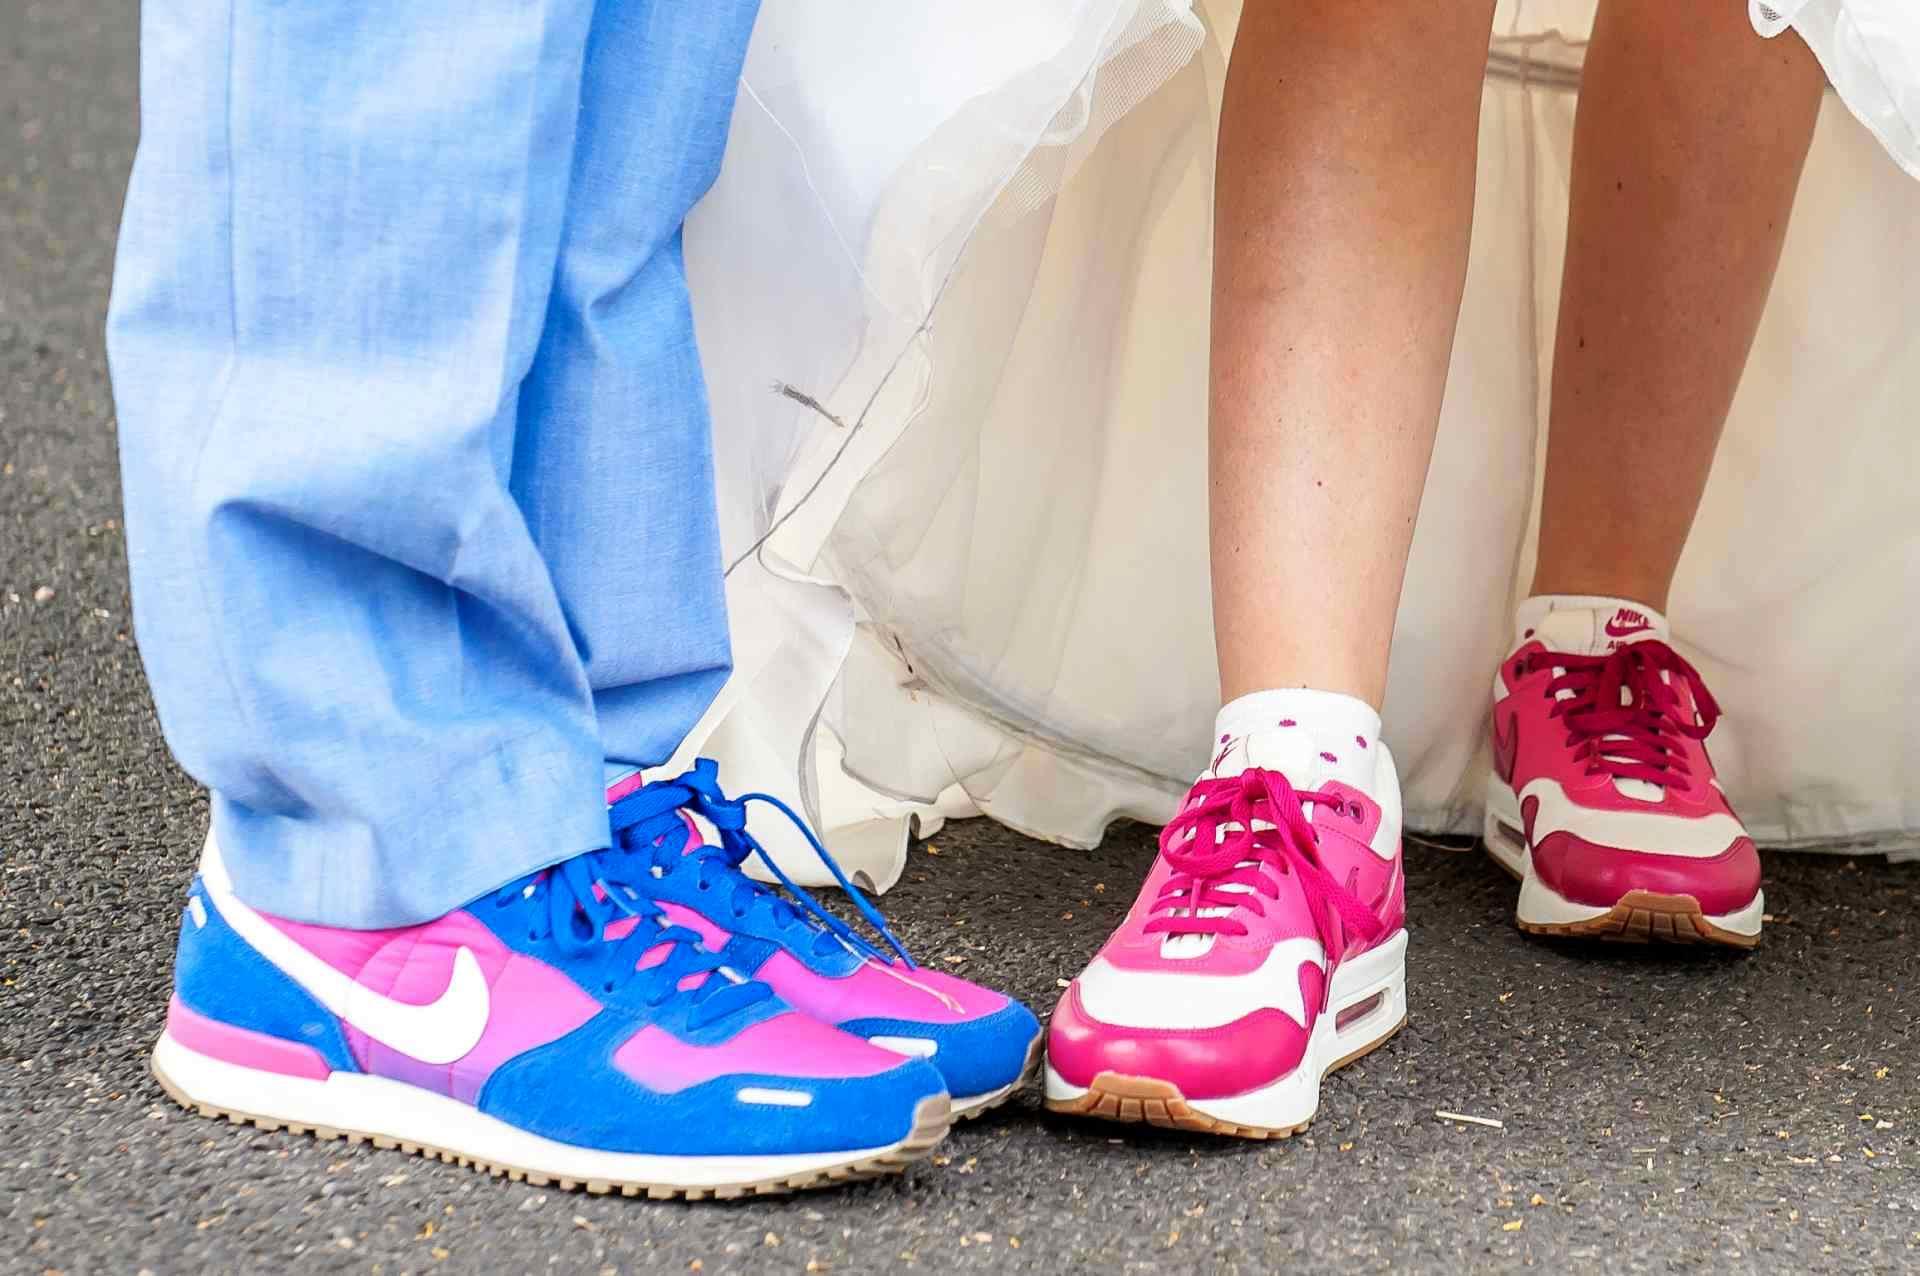 Schuhe Sneakerwedding Köln